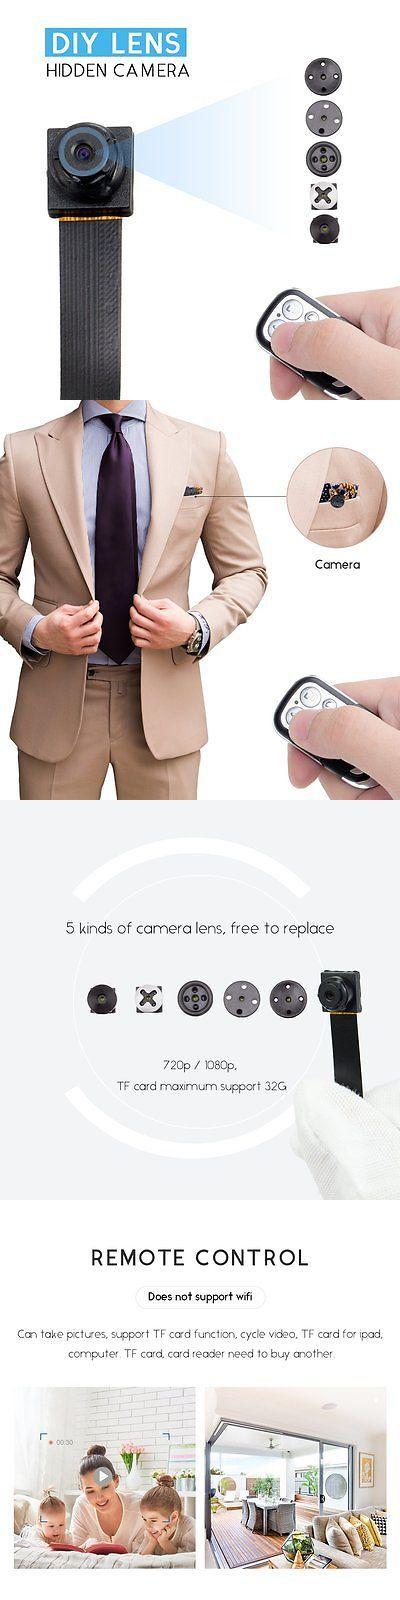 Digital Video Recorders Cards: Fredi Hd 1080P/720P Mini Super Small Portable Diy Hidden Spy Camera Loop Video BUY IT NOW ONLY: $30.59